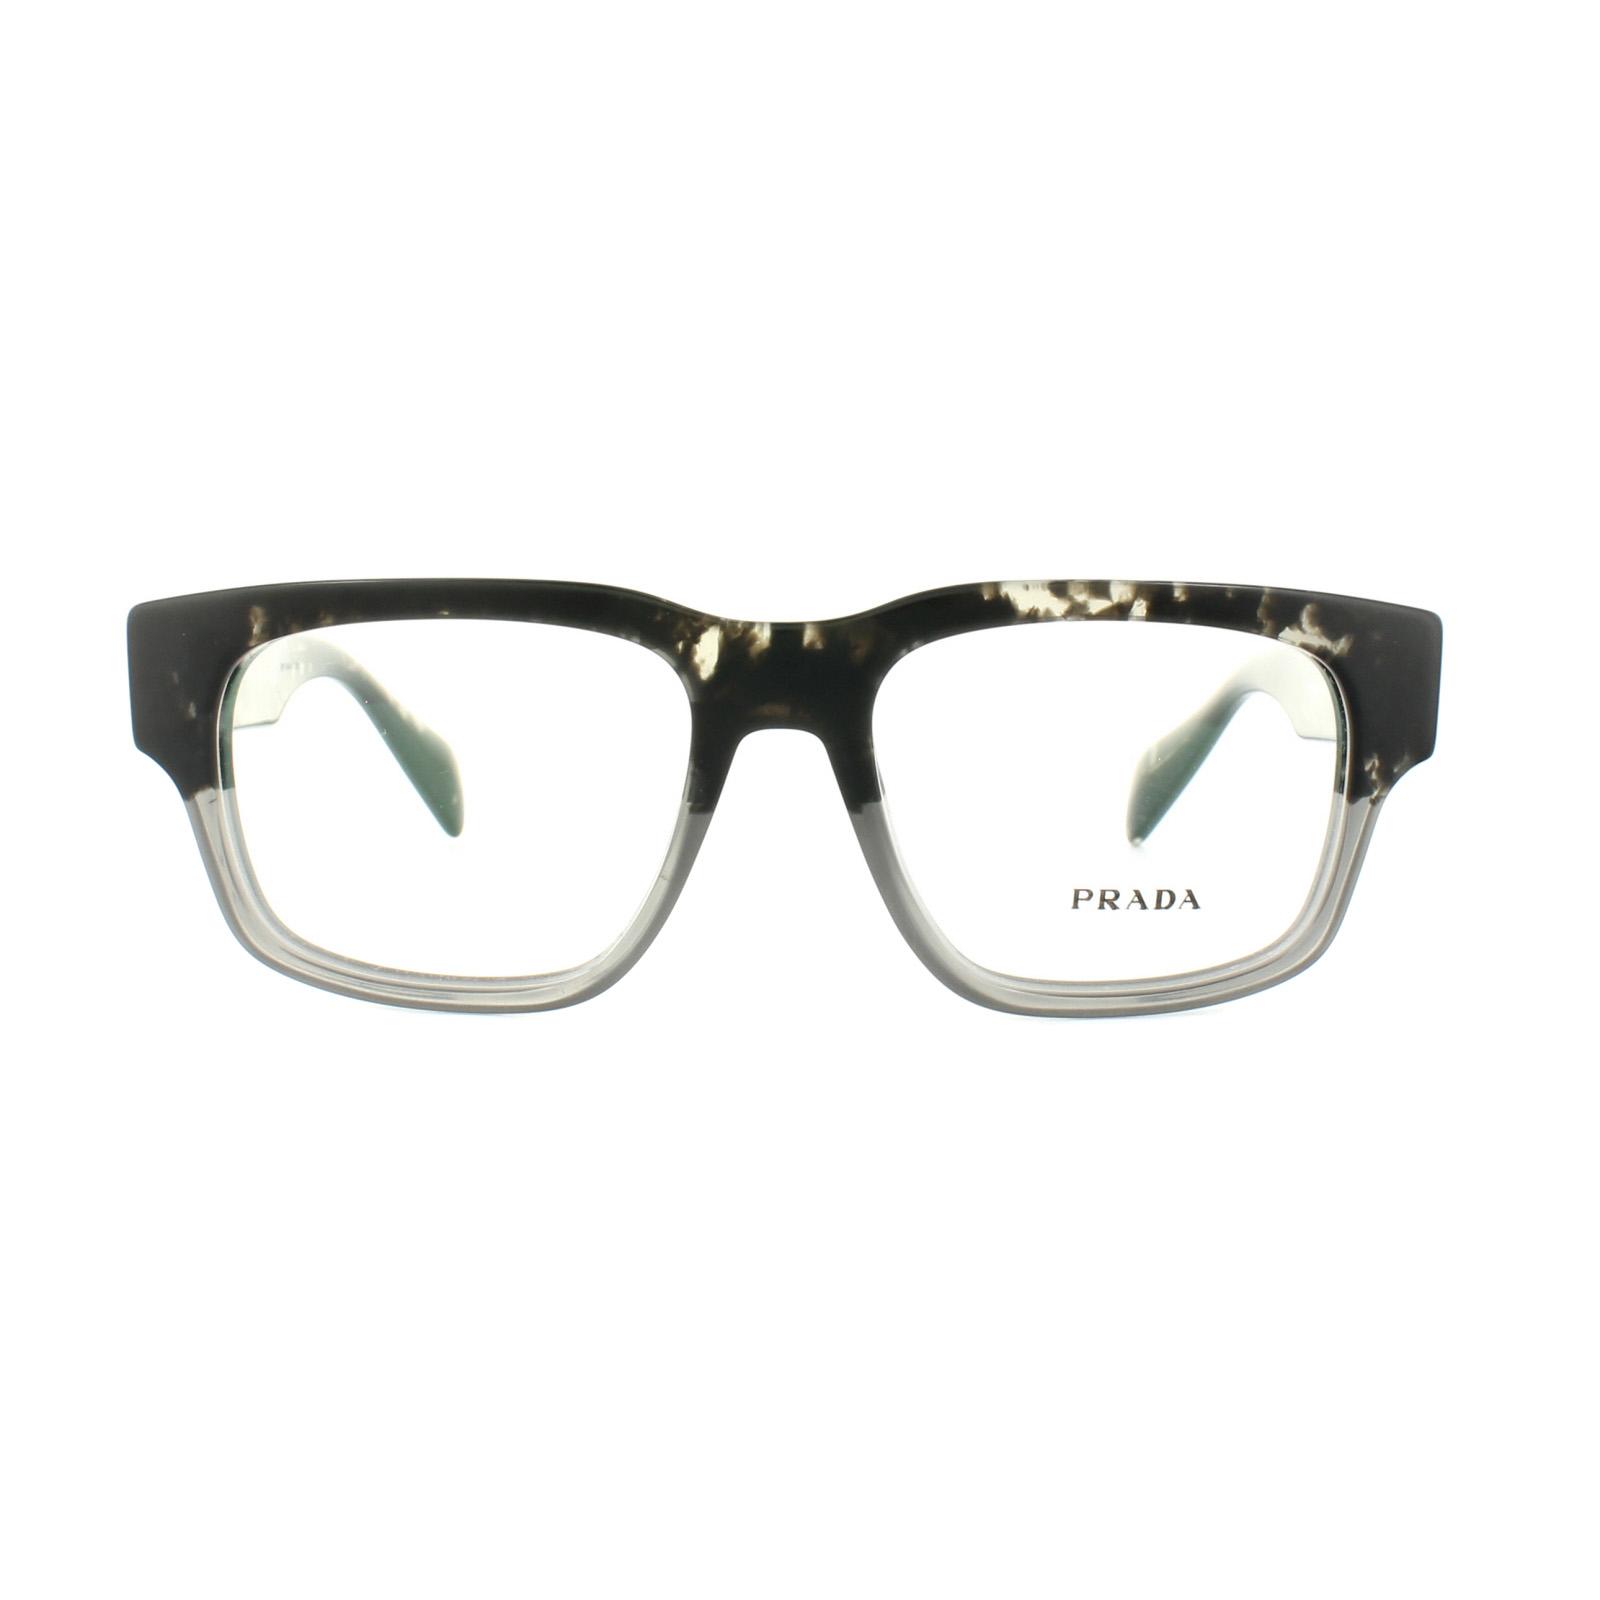 Prada Glasses Frames PR19QV RO31O1 Spotted Black on Matt Grey 51mm ...